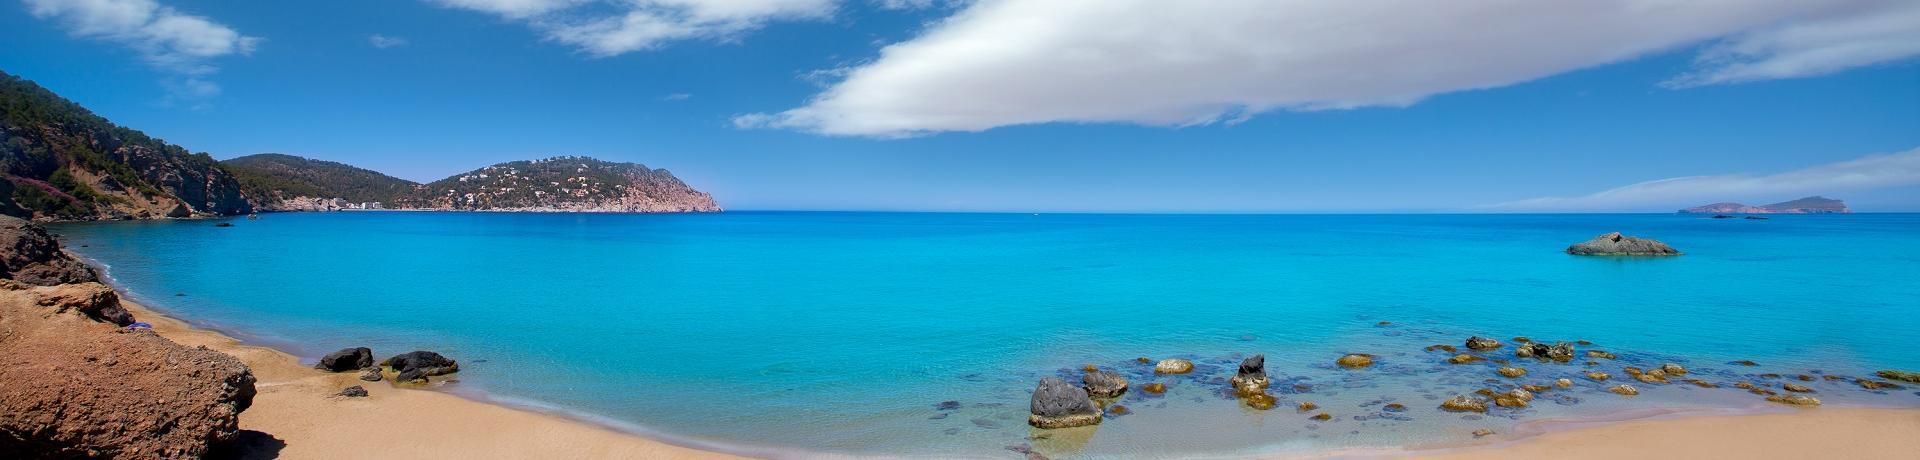 Spanien: Ibiza - Emotion